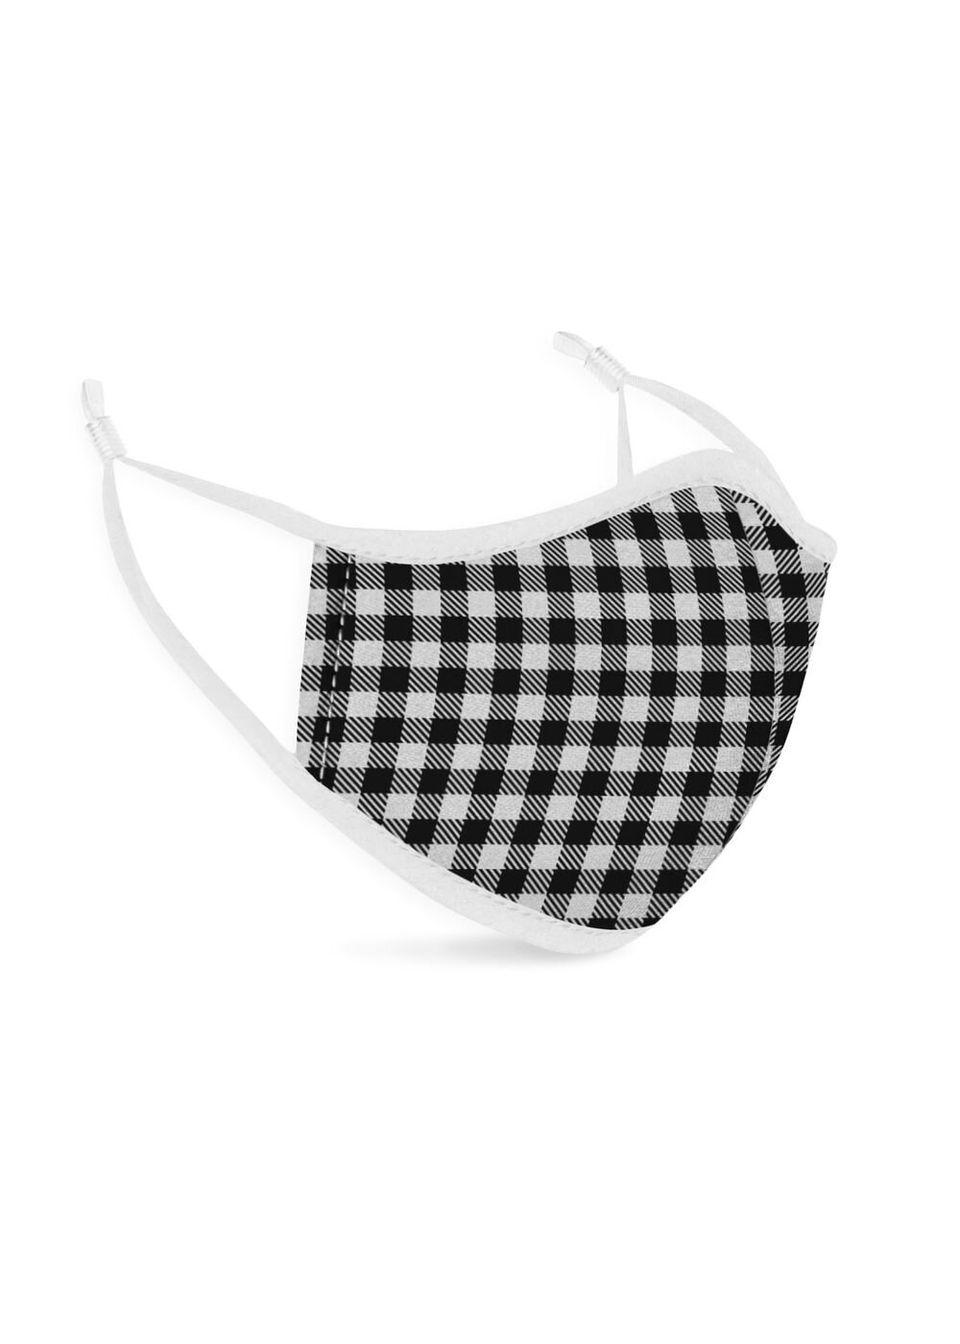 Where To Buy Cloth Face Masks For Coronavirus Online 16